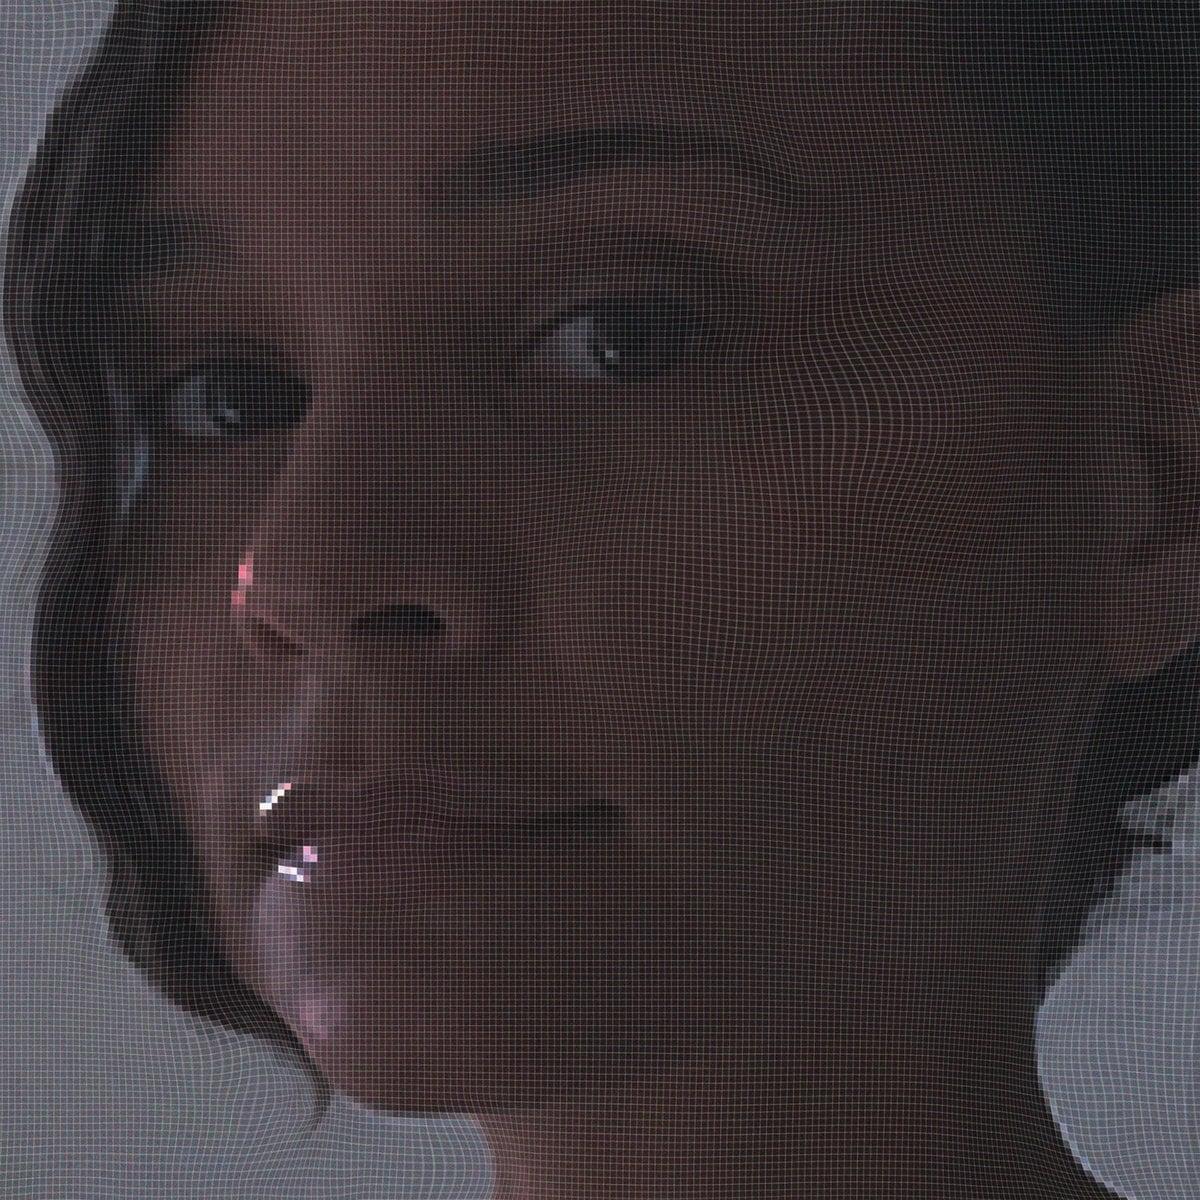 Erika de Casier / Sensational(LP)